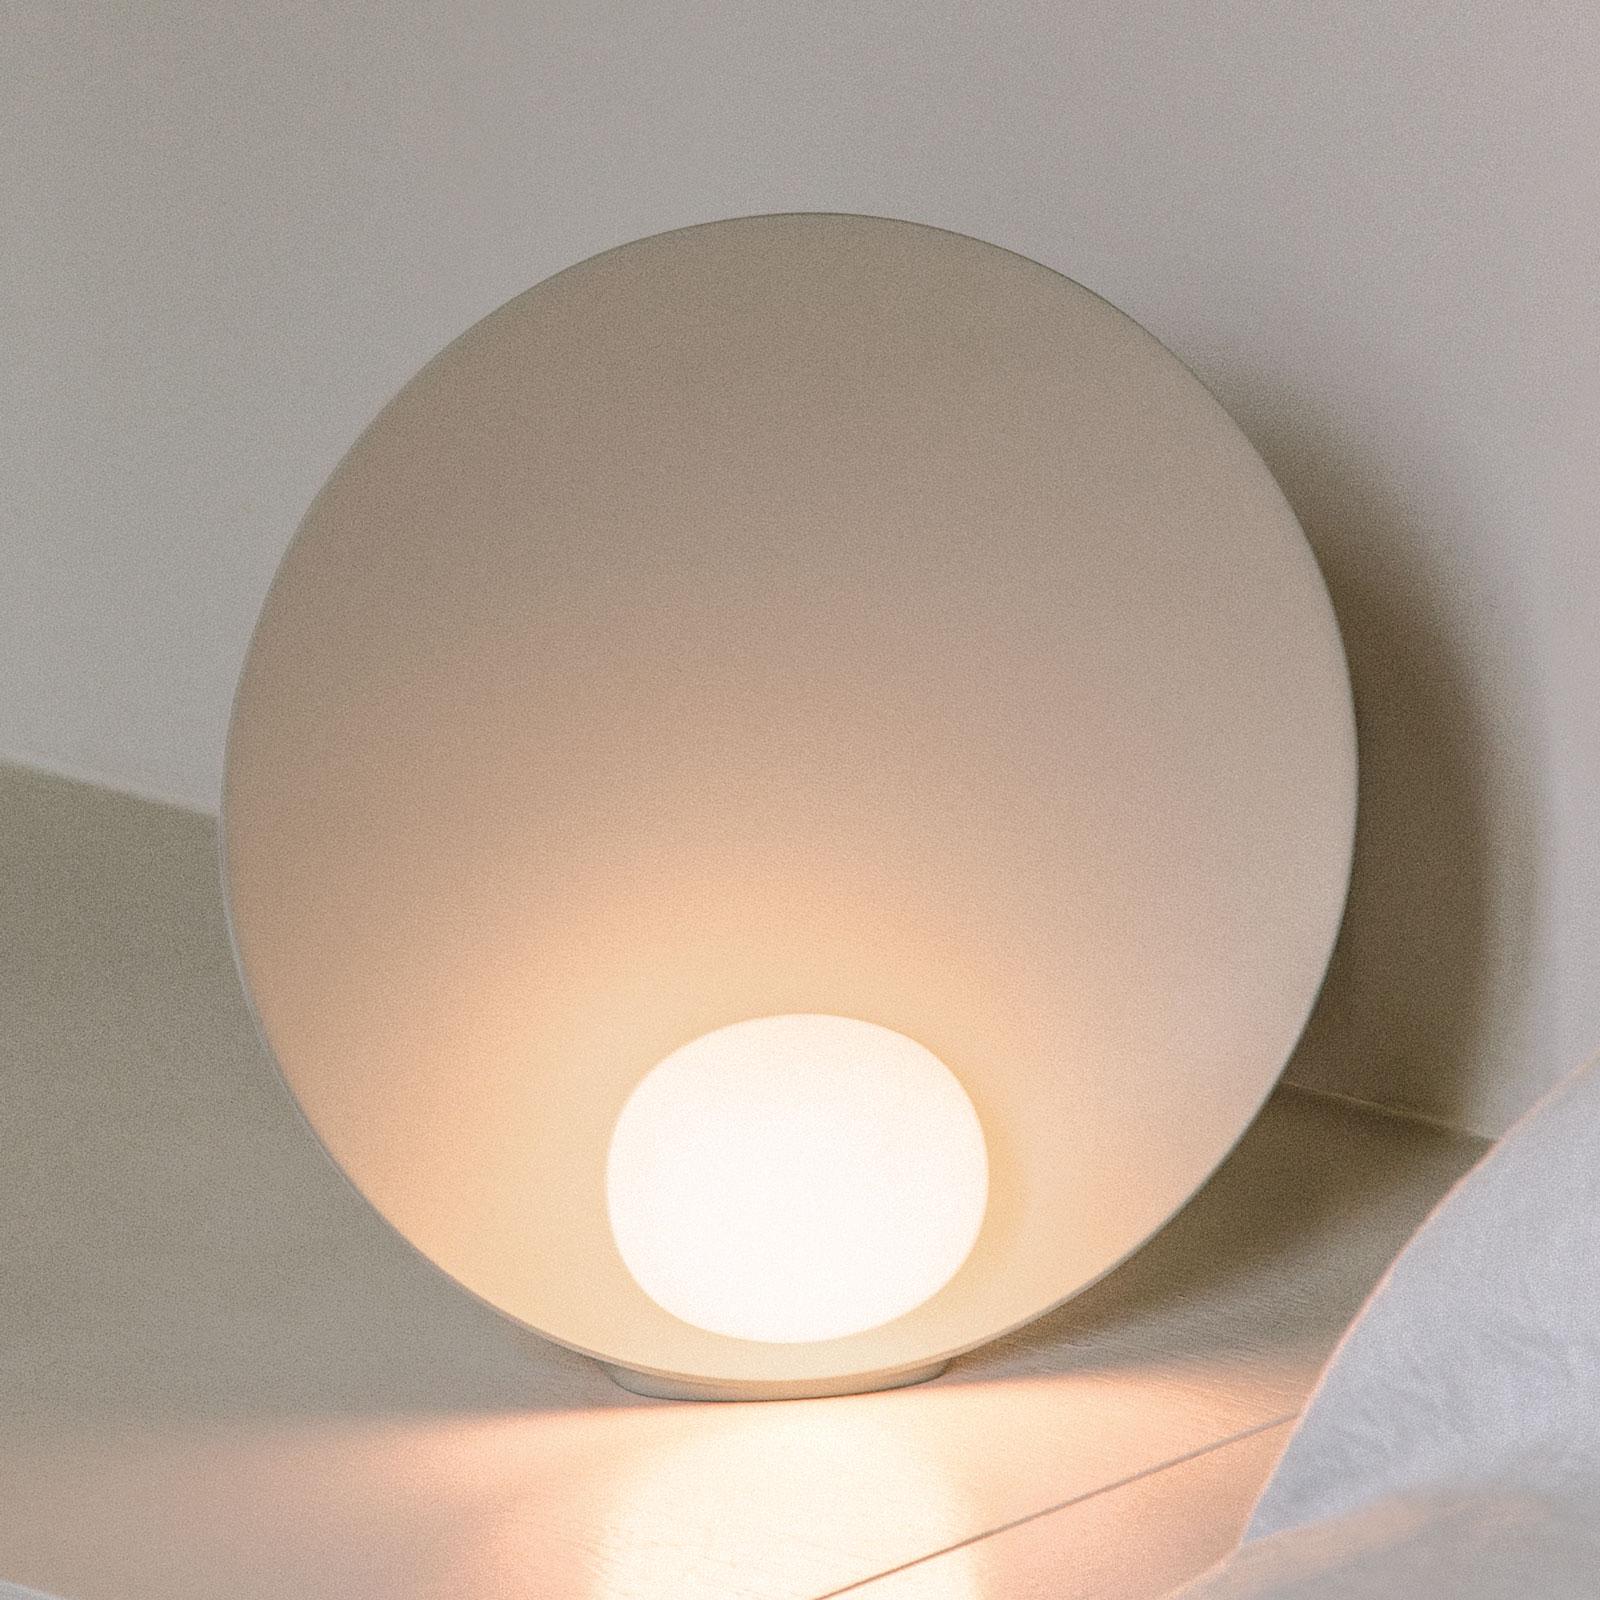 Vibia Musa 7400 LED tafellamp staand, taupe